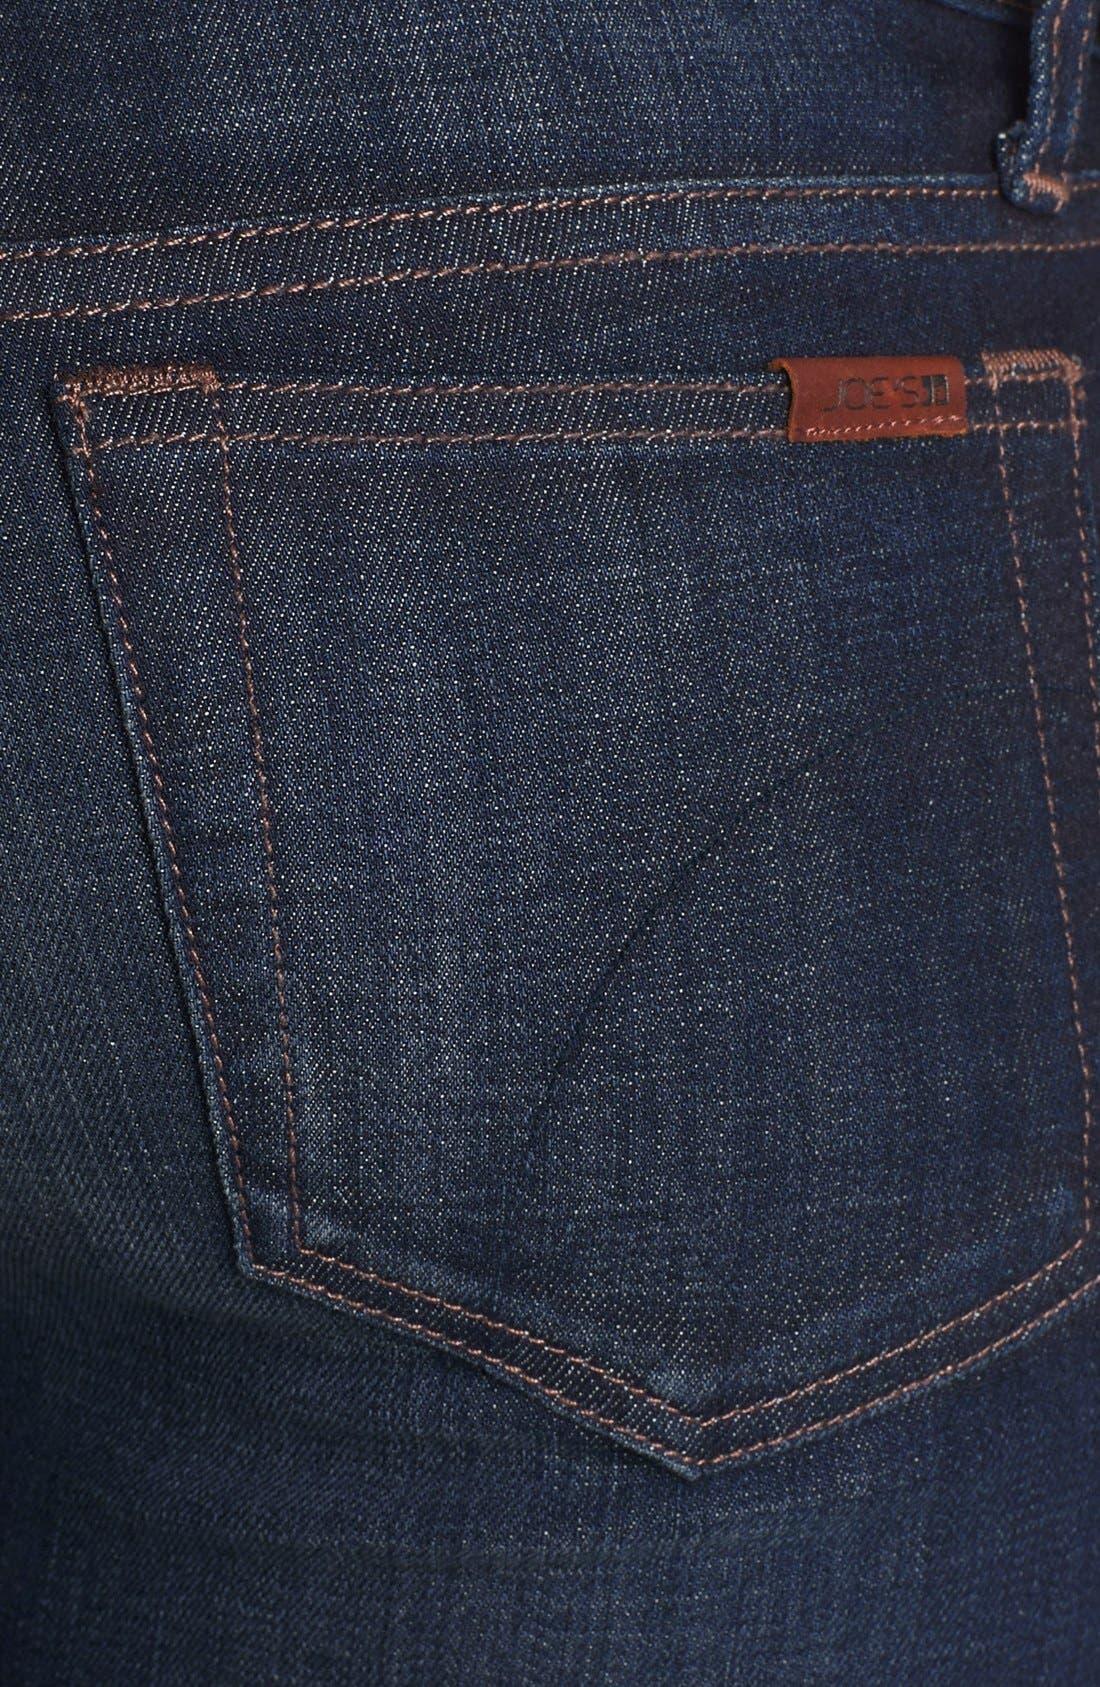 Alternate Image 3  - Joe's 'The Honey' Curvy Bootcut Jeans (Dixie)